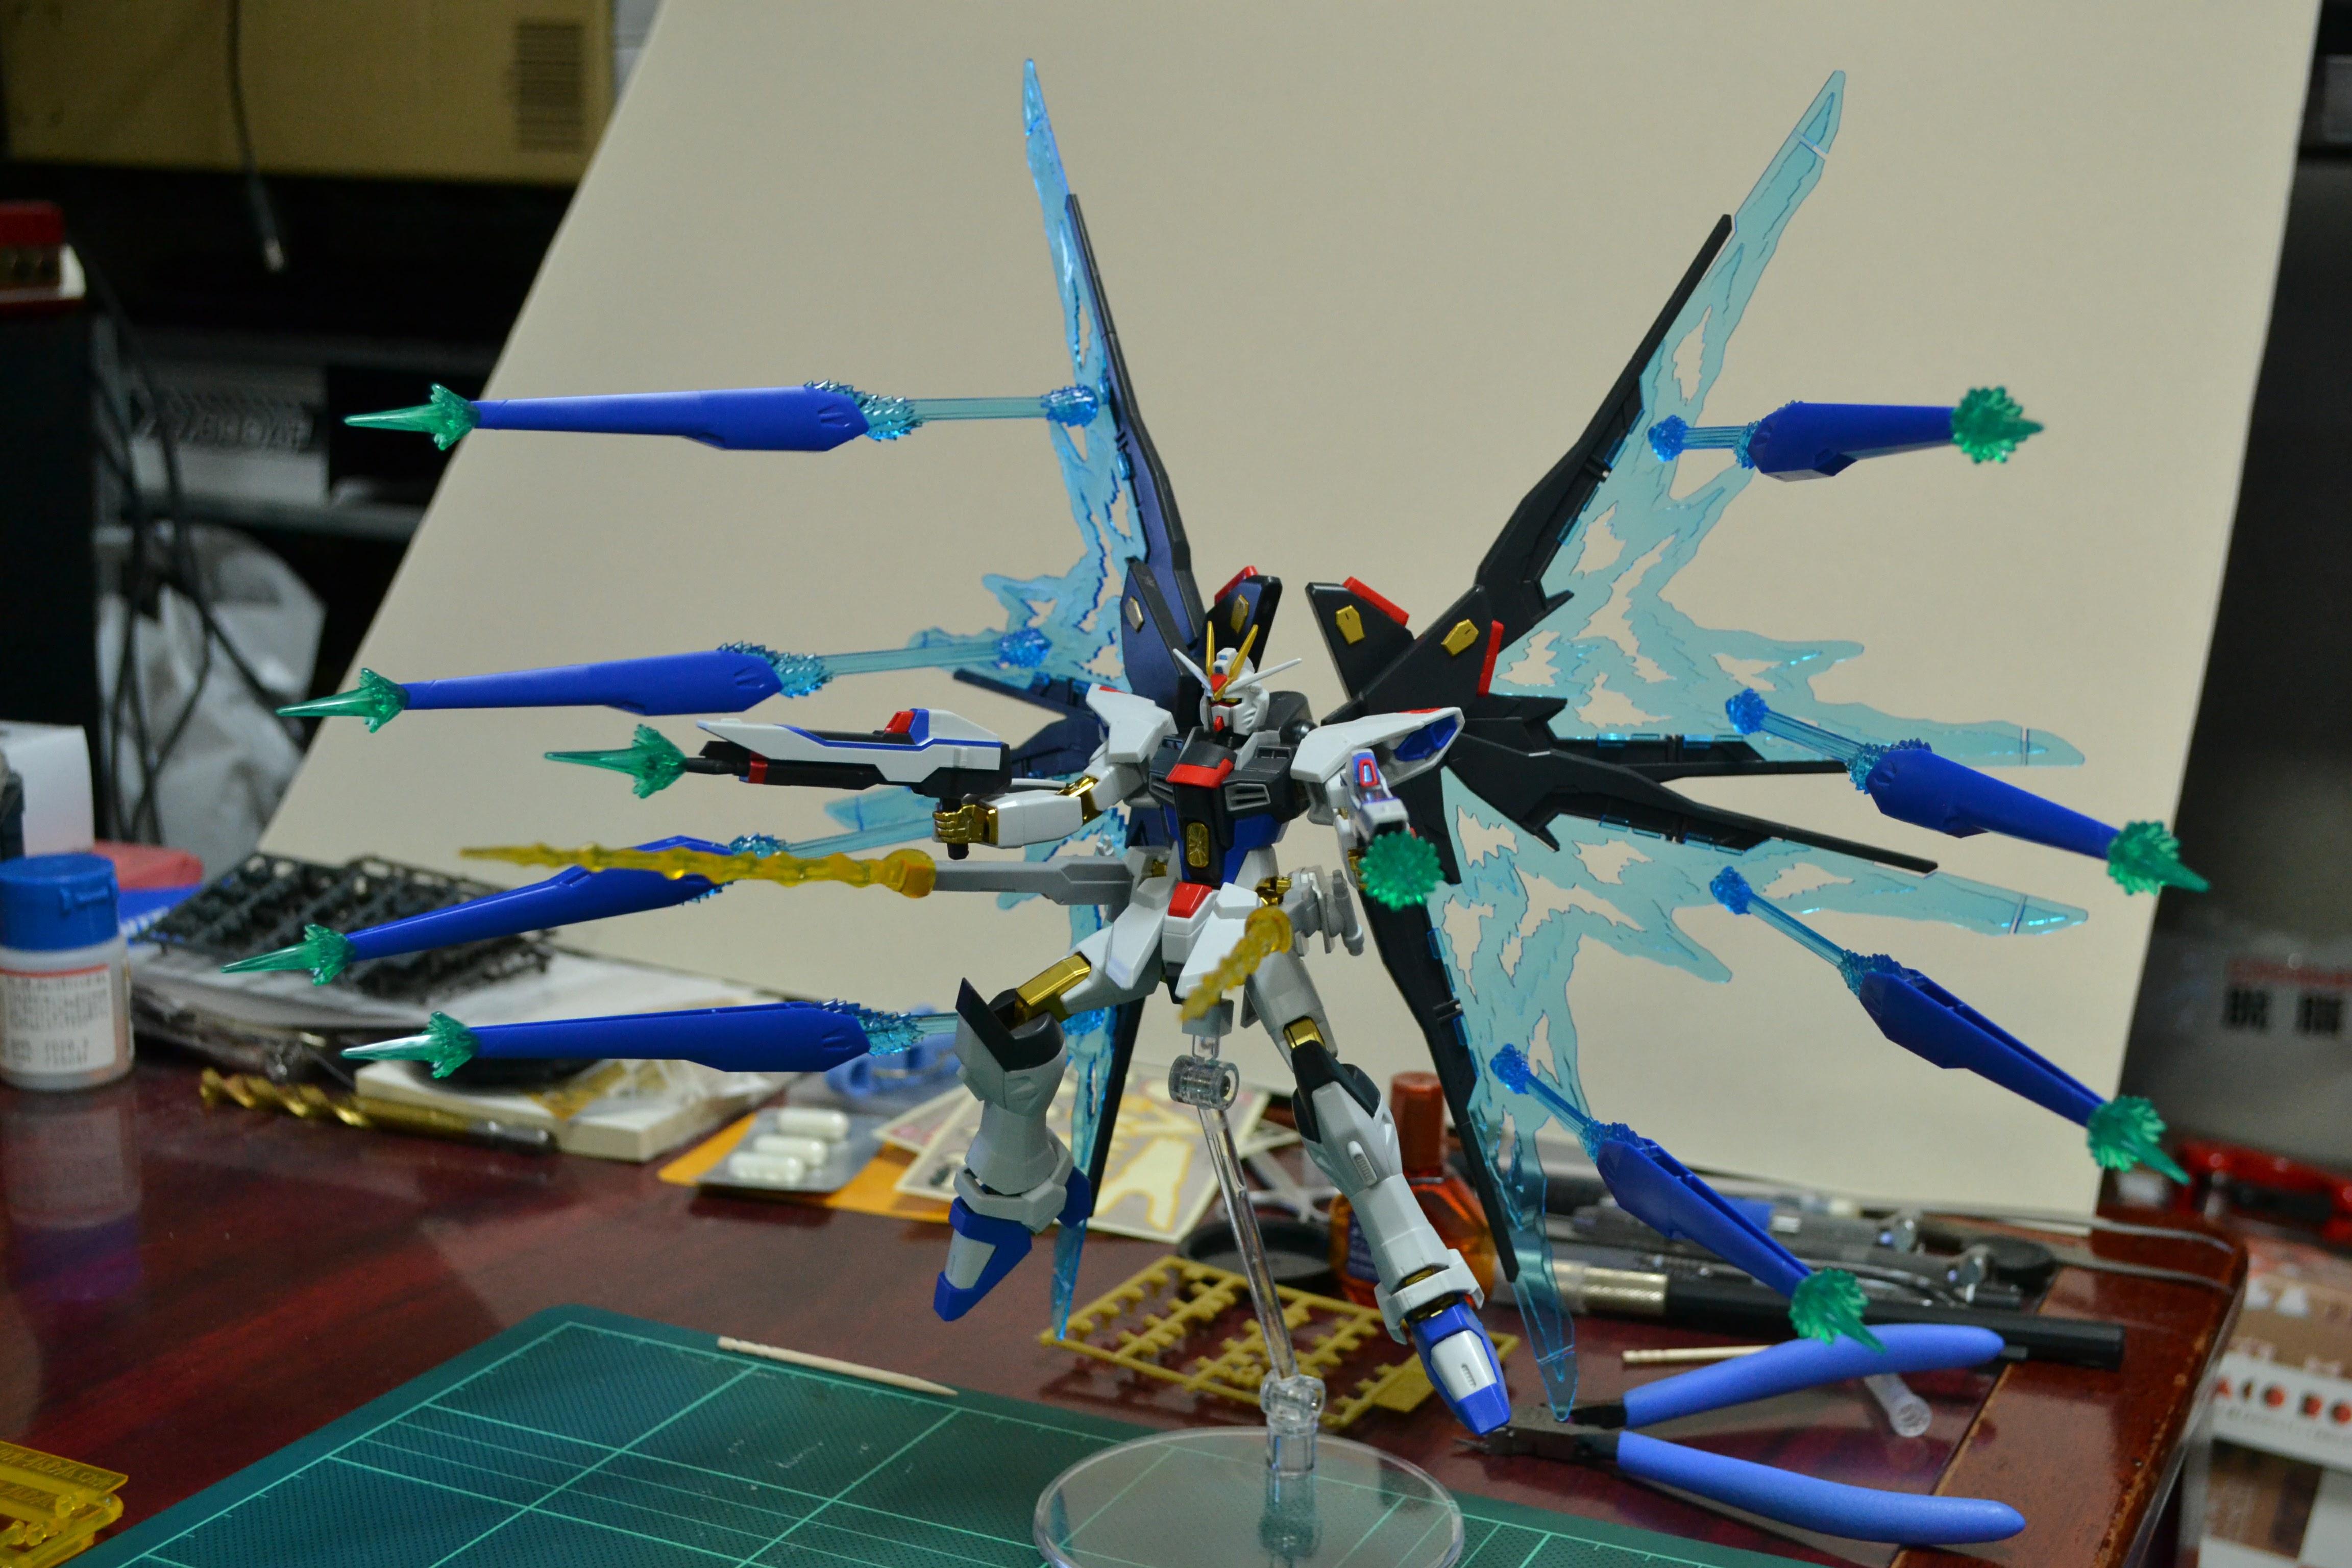 HGCE 1/144 ZGMF-X20A ストライクフリーダムガンダム 光の翼DXエディション [Strike Freedom Gundam (Revive Ver. Wing of Light DX Edition)]